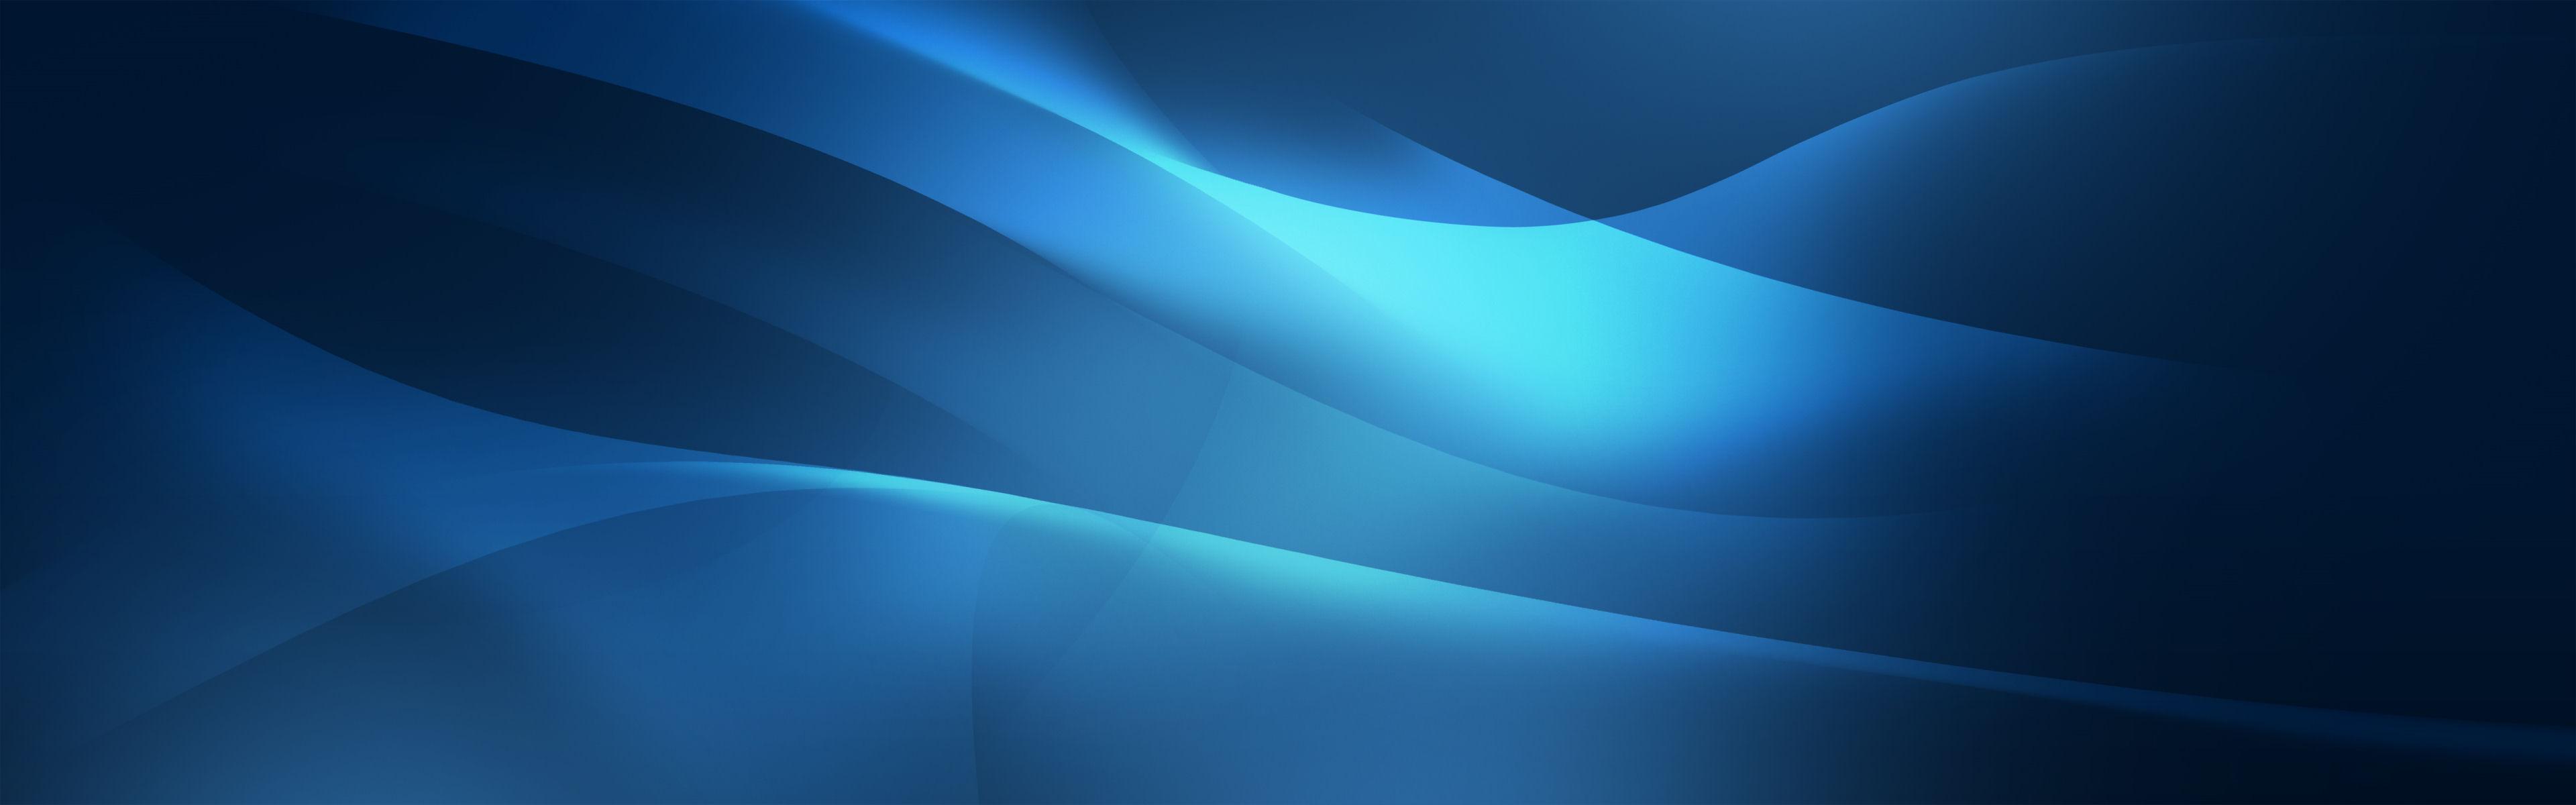 Free Download Dual Screen Dual Monitor Wallpaper Hd Walls